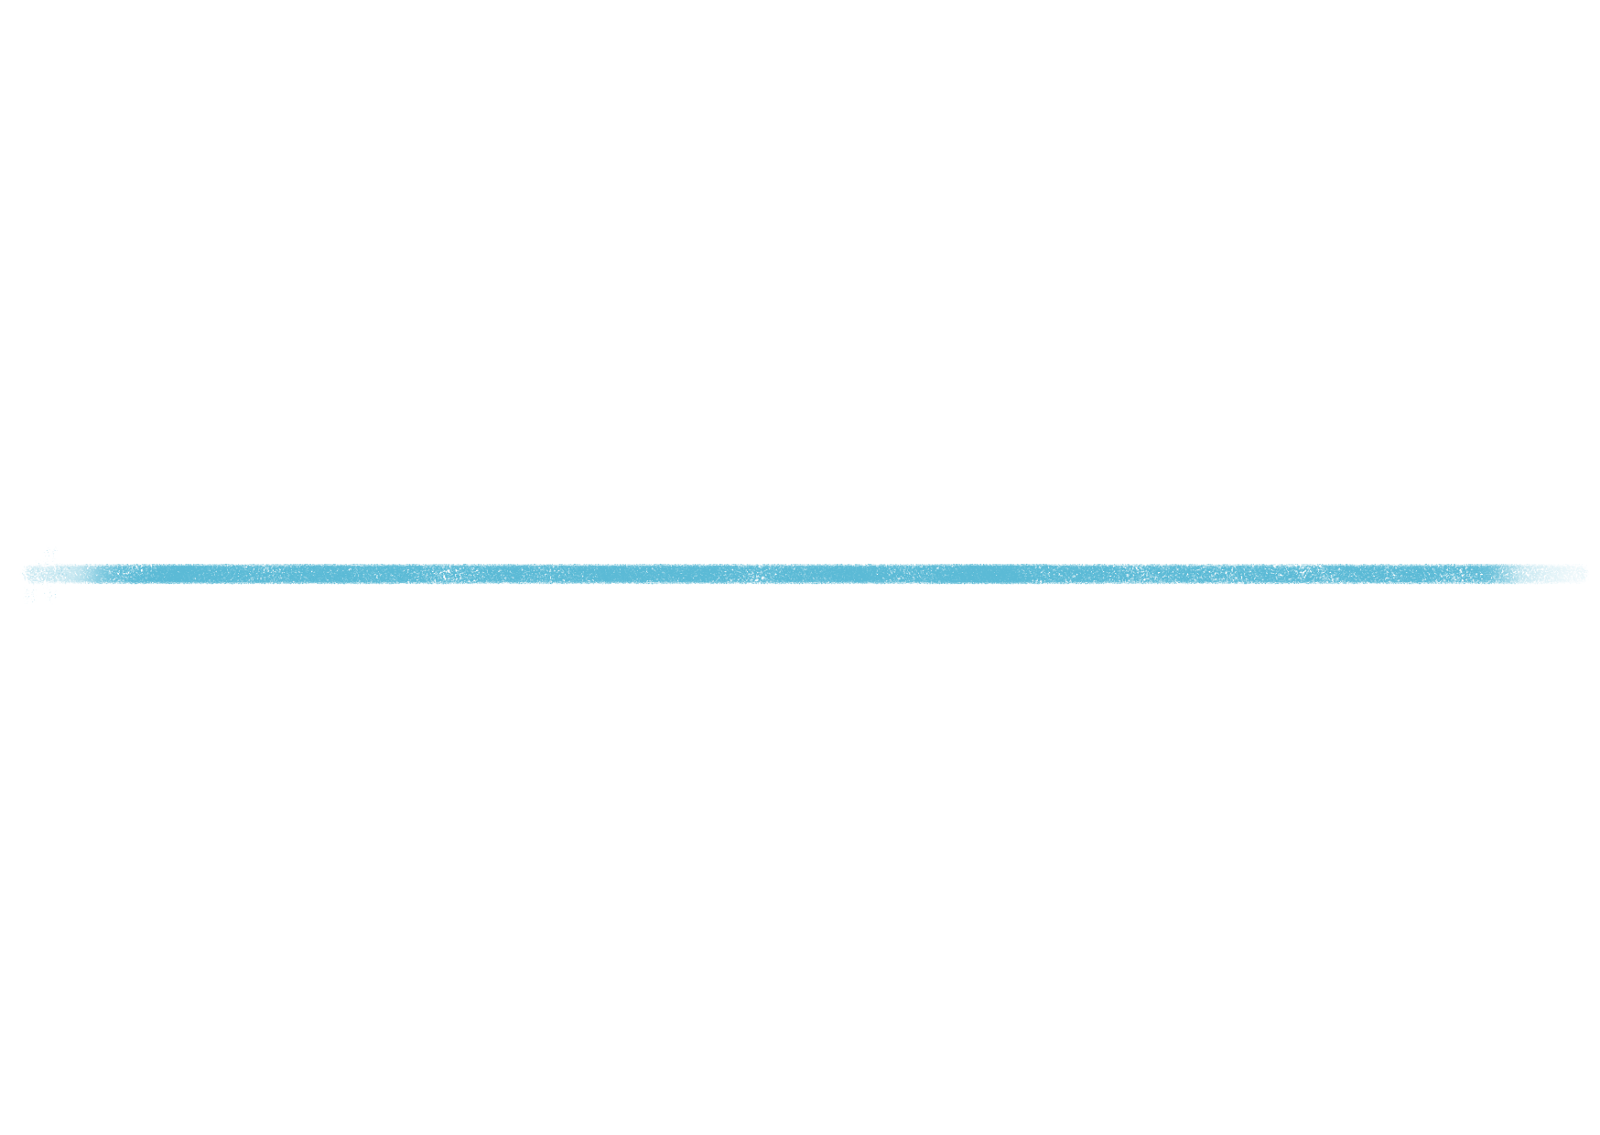 Straight Line Dividers Clip Art